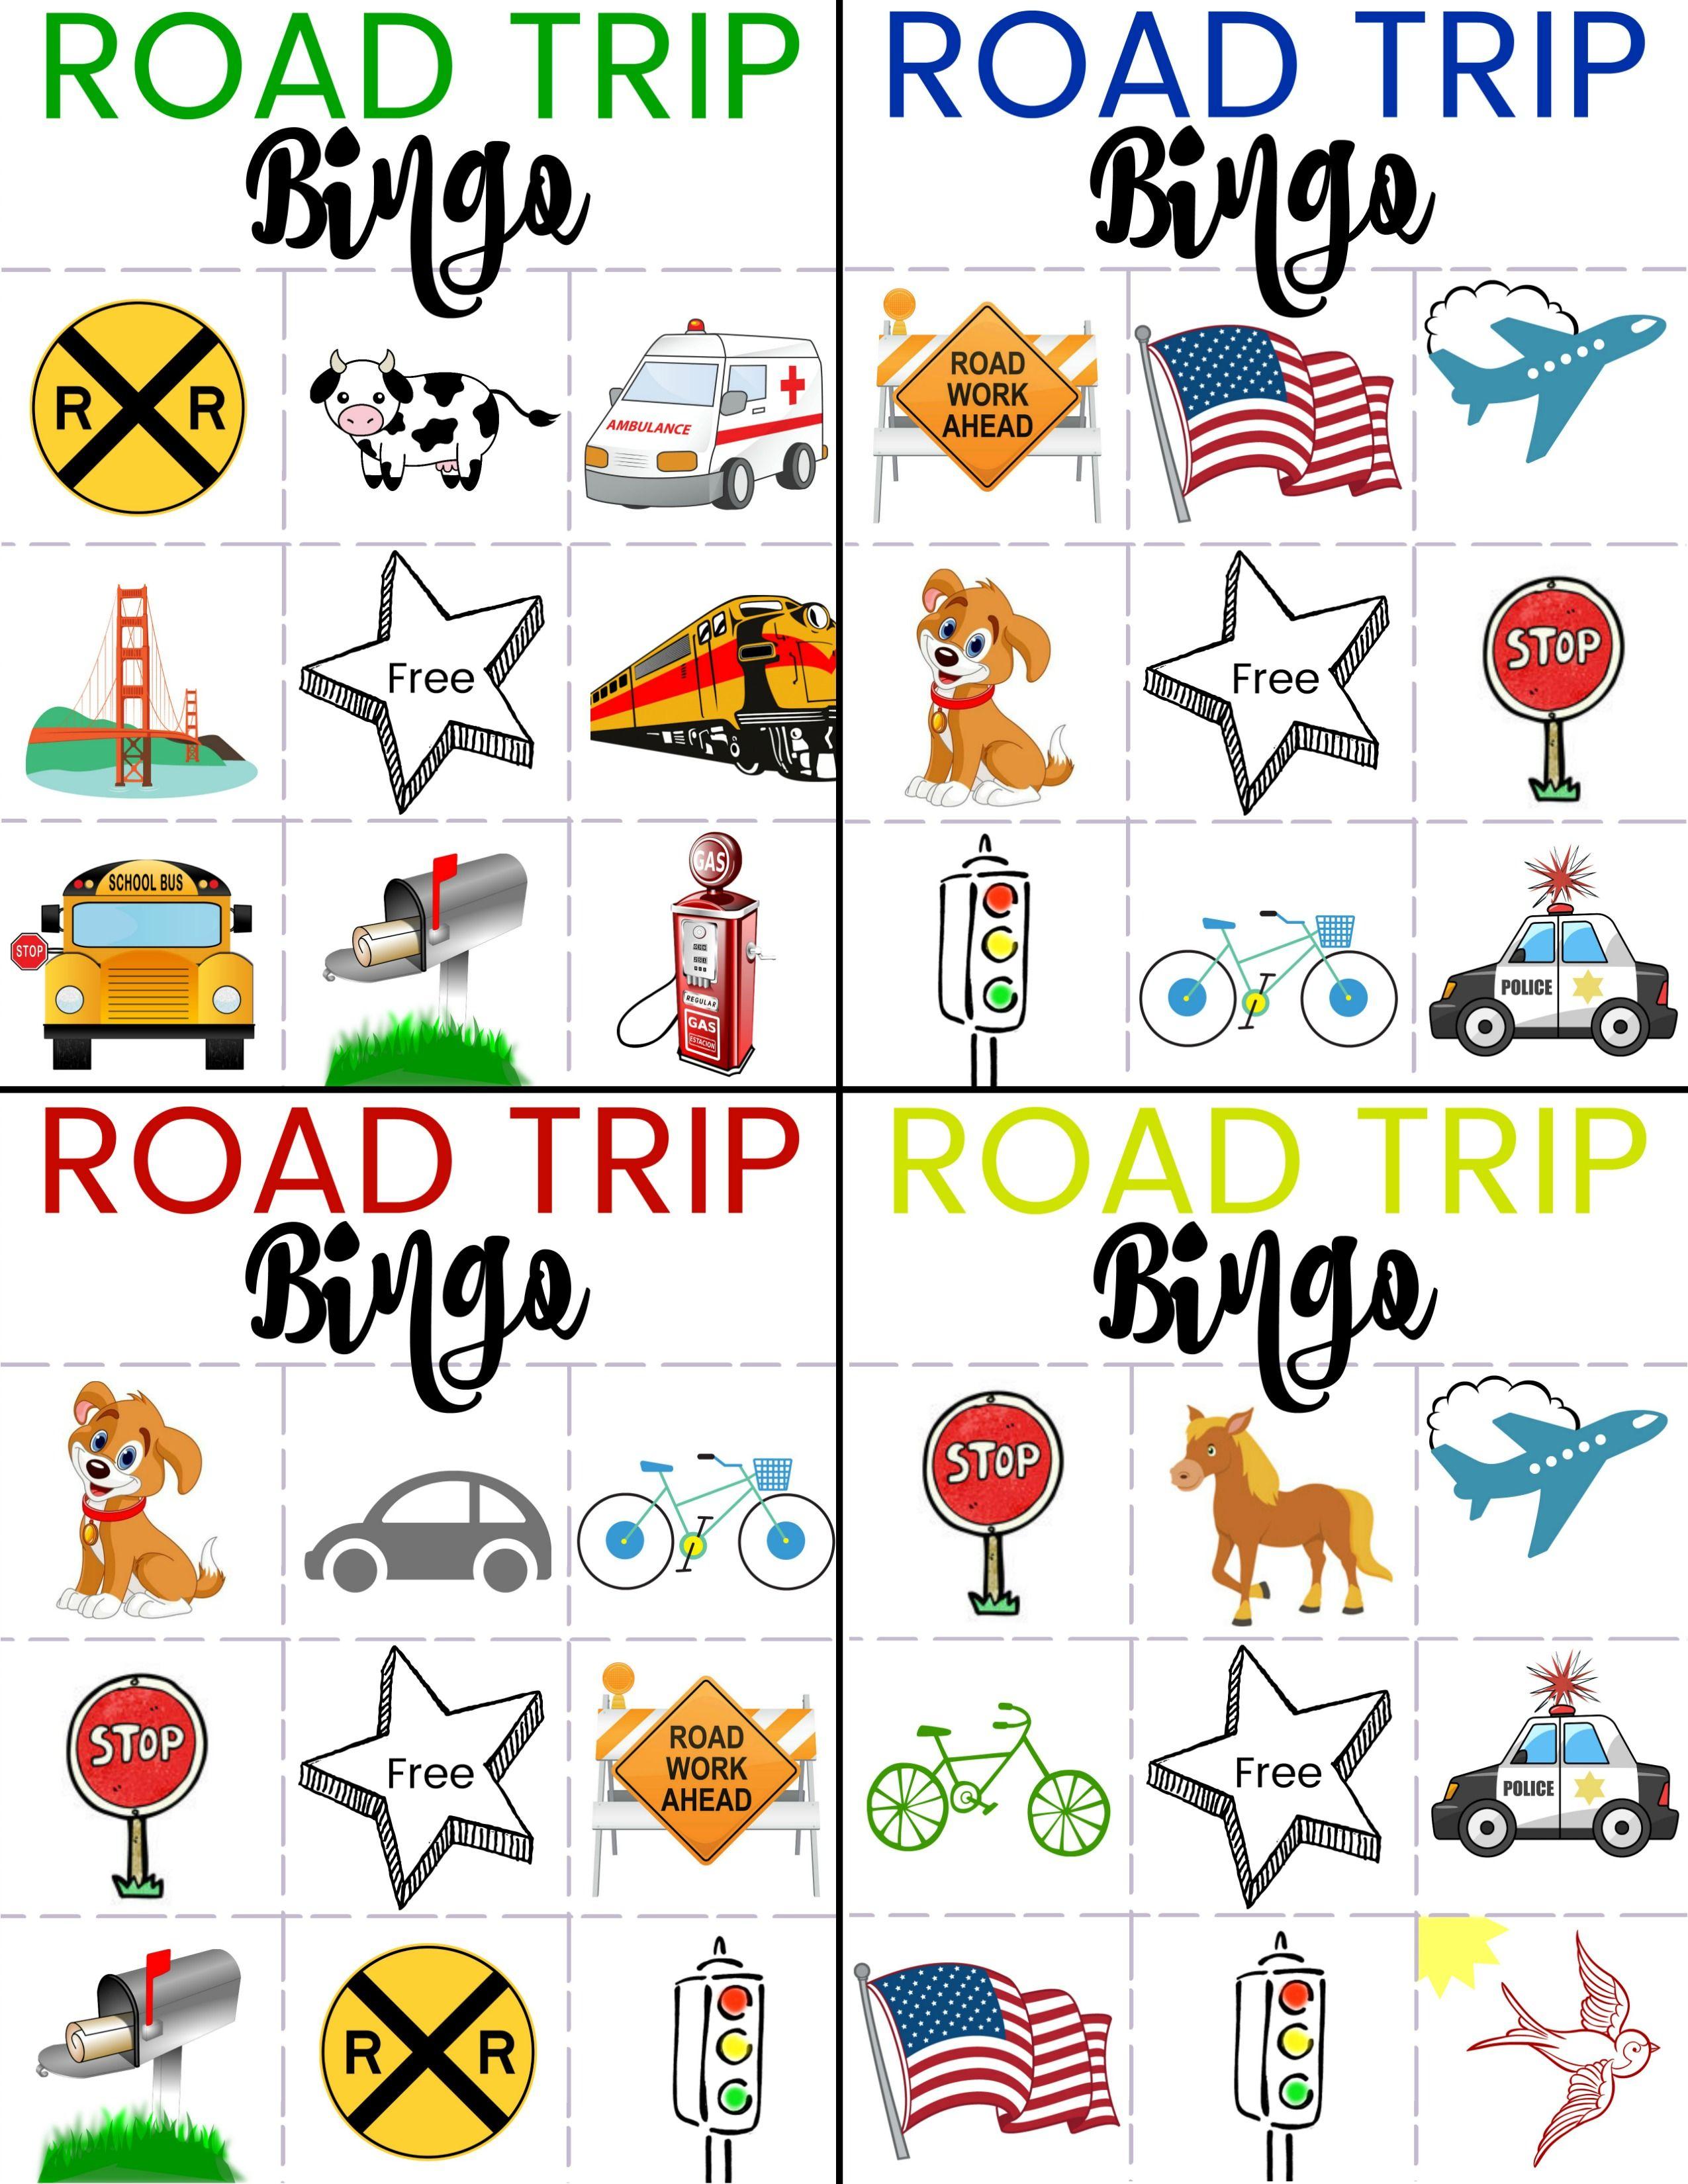 Road Trip Bingo Game for Kids Environmental print